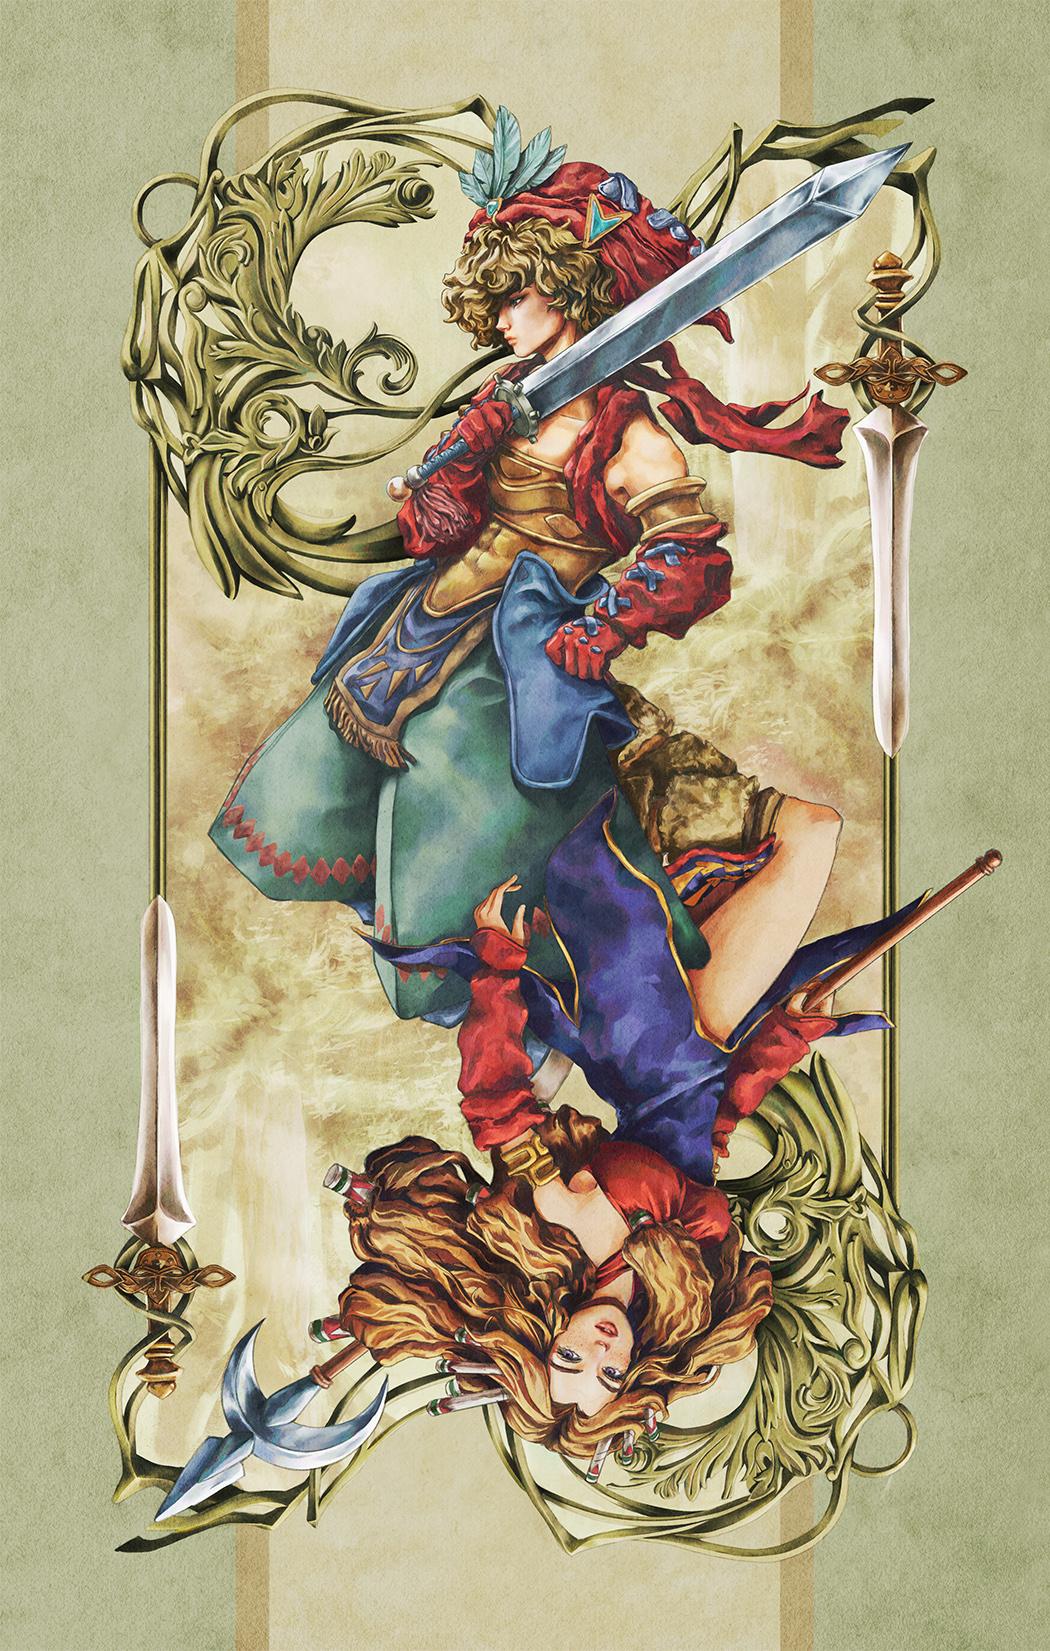 Paola Tuazon - 聖剣伝説 Seiken Densetsu: Legend of Mana - Hero Male Character Fanart PS1 JRPG Game